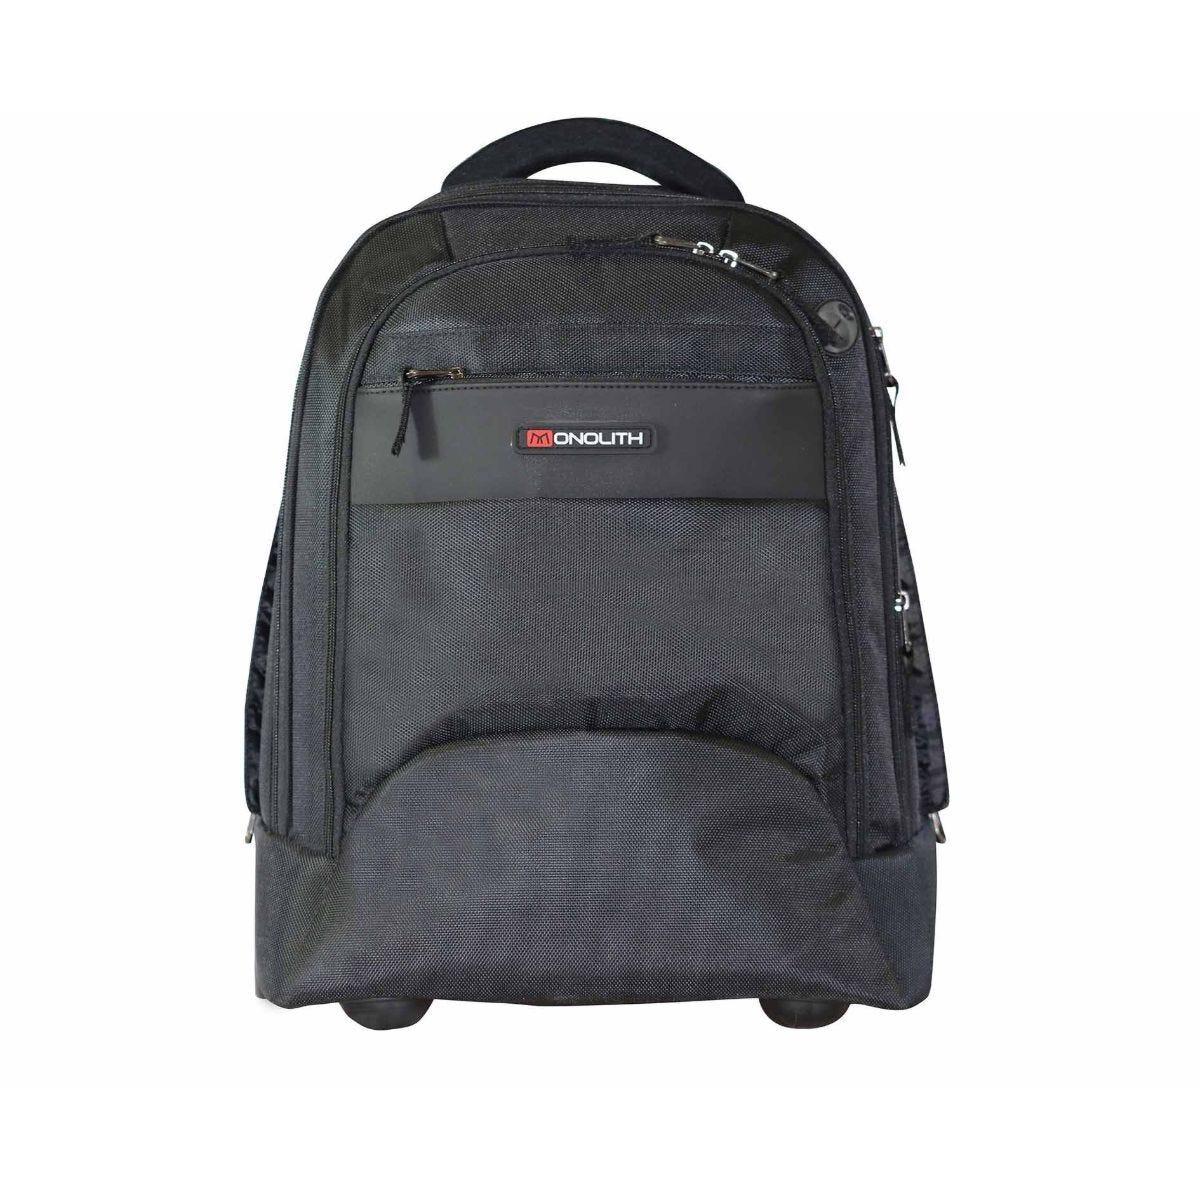 Monolith Motion II Wheeled 15.6 inch Laptop Backpack